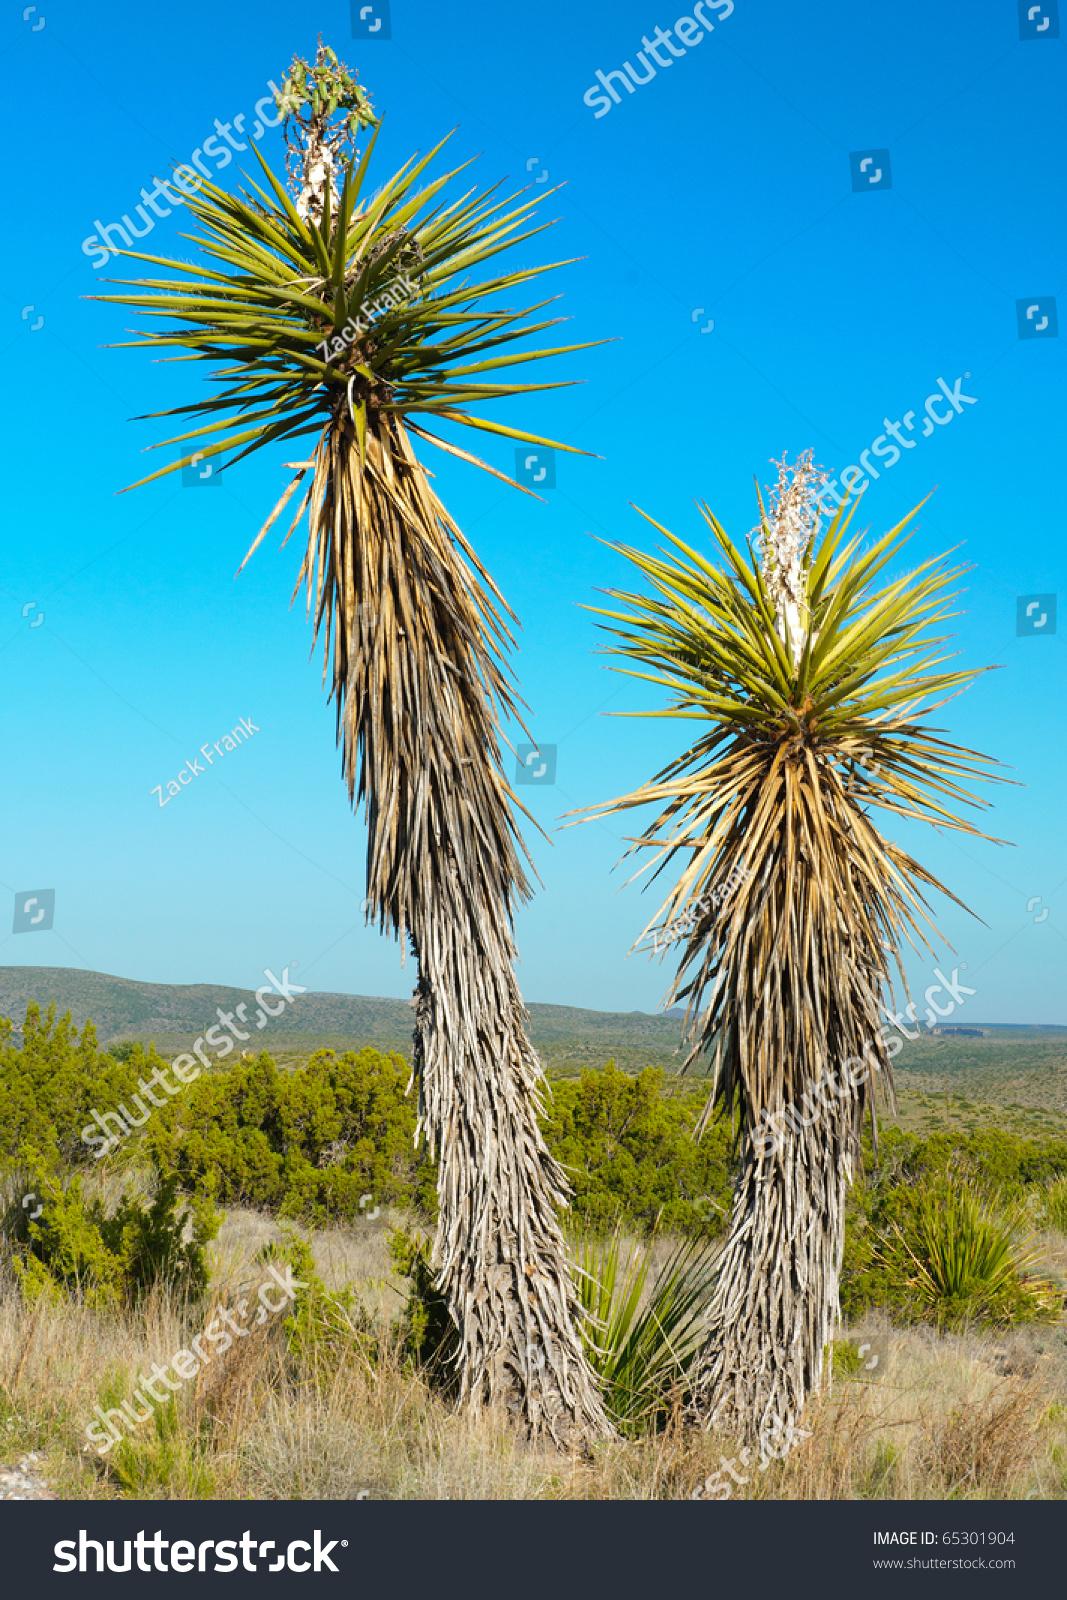 Soap Tree Yucca Stock Photo 65301904 : Shutterstock